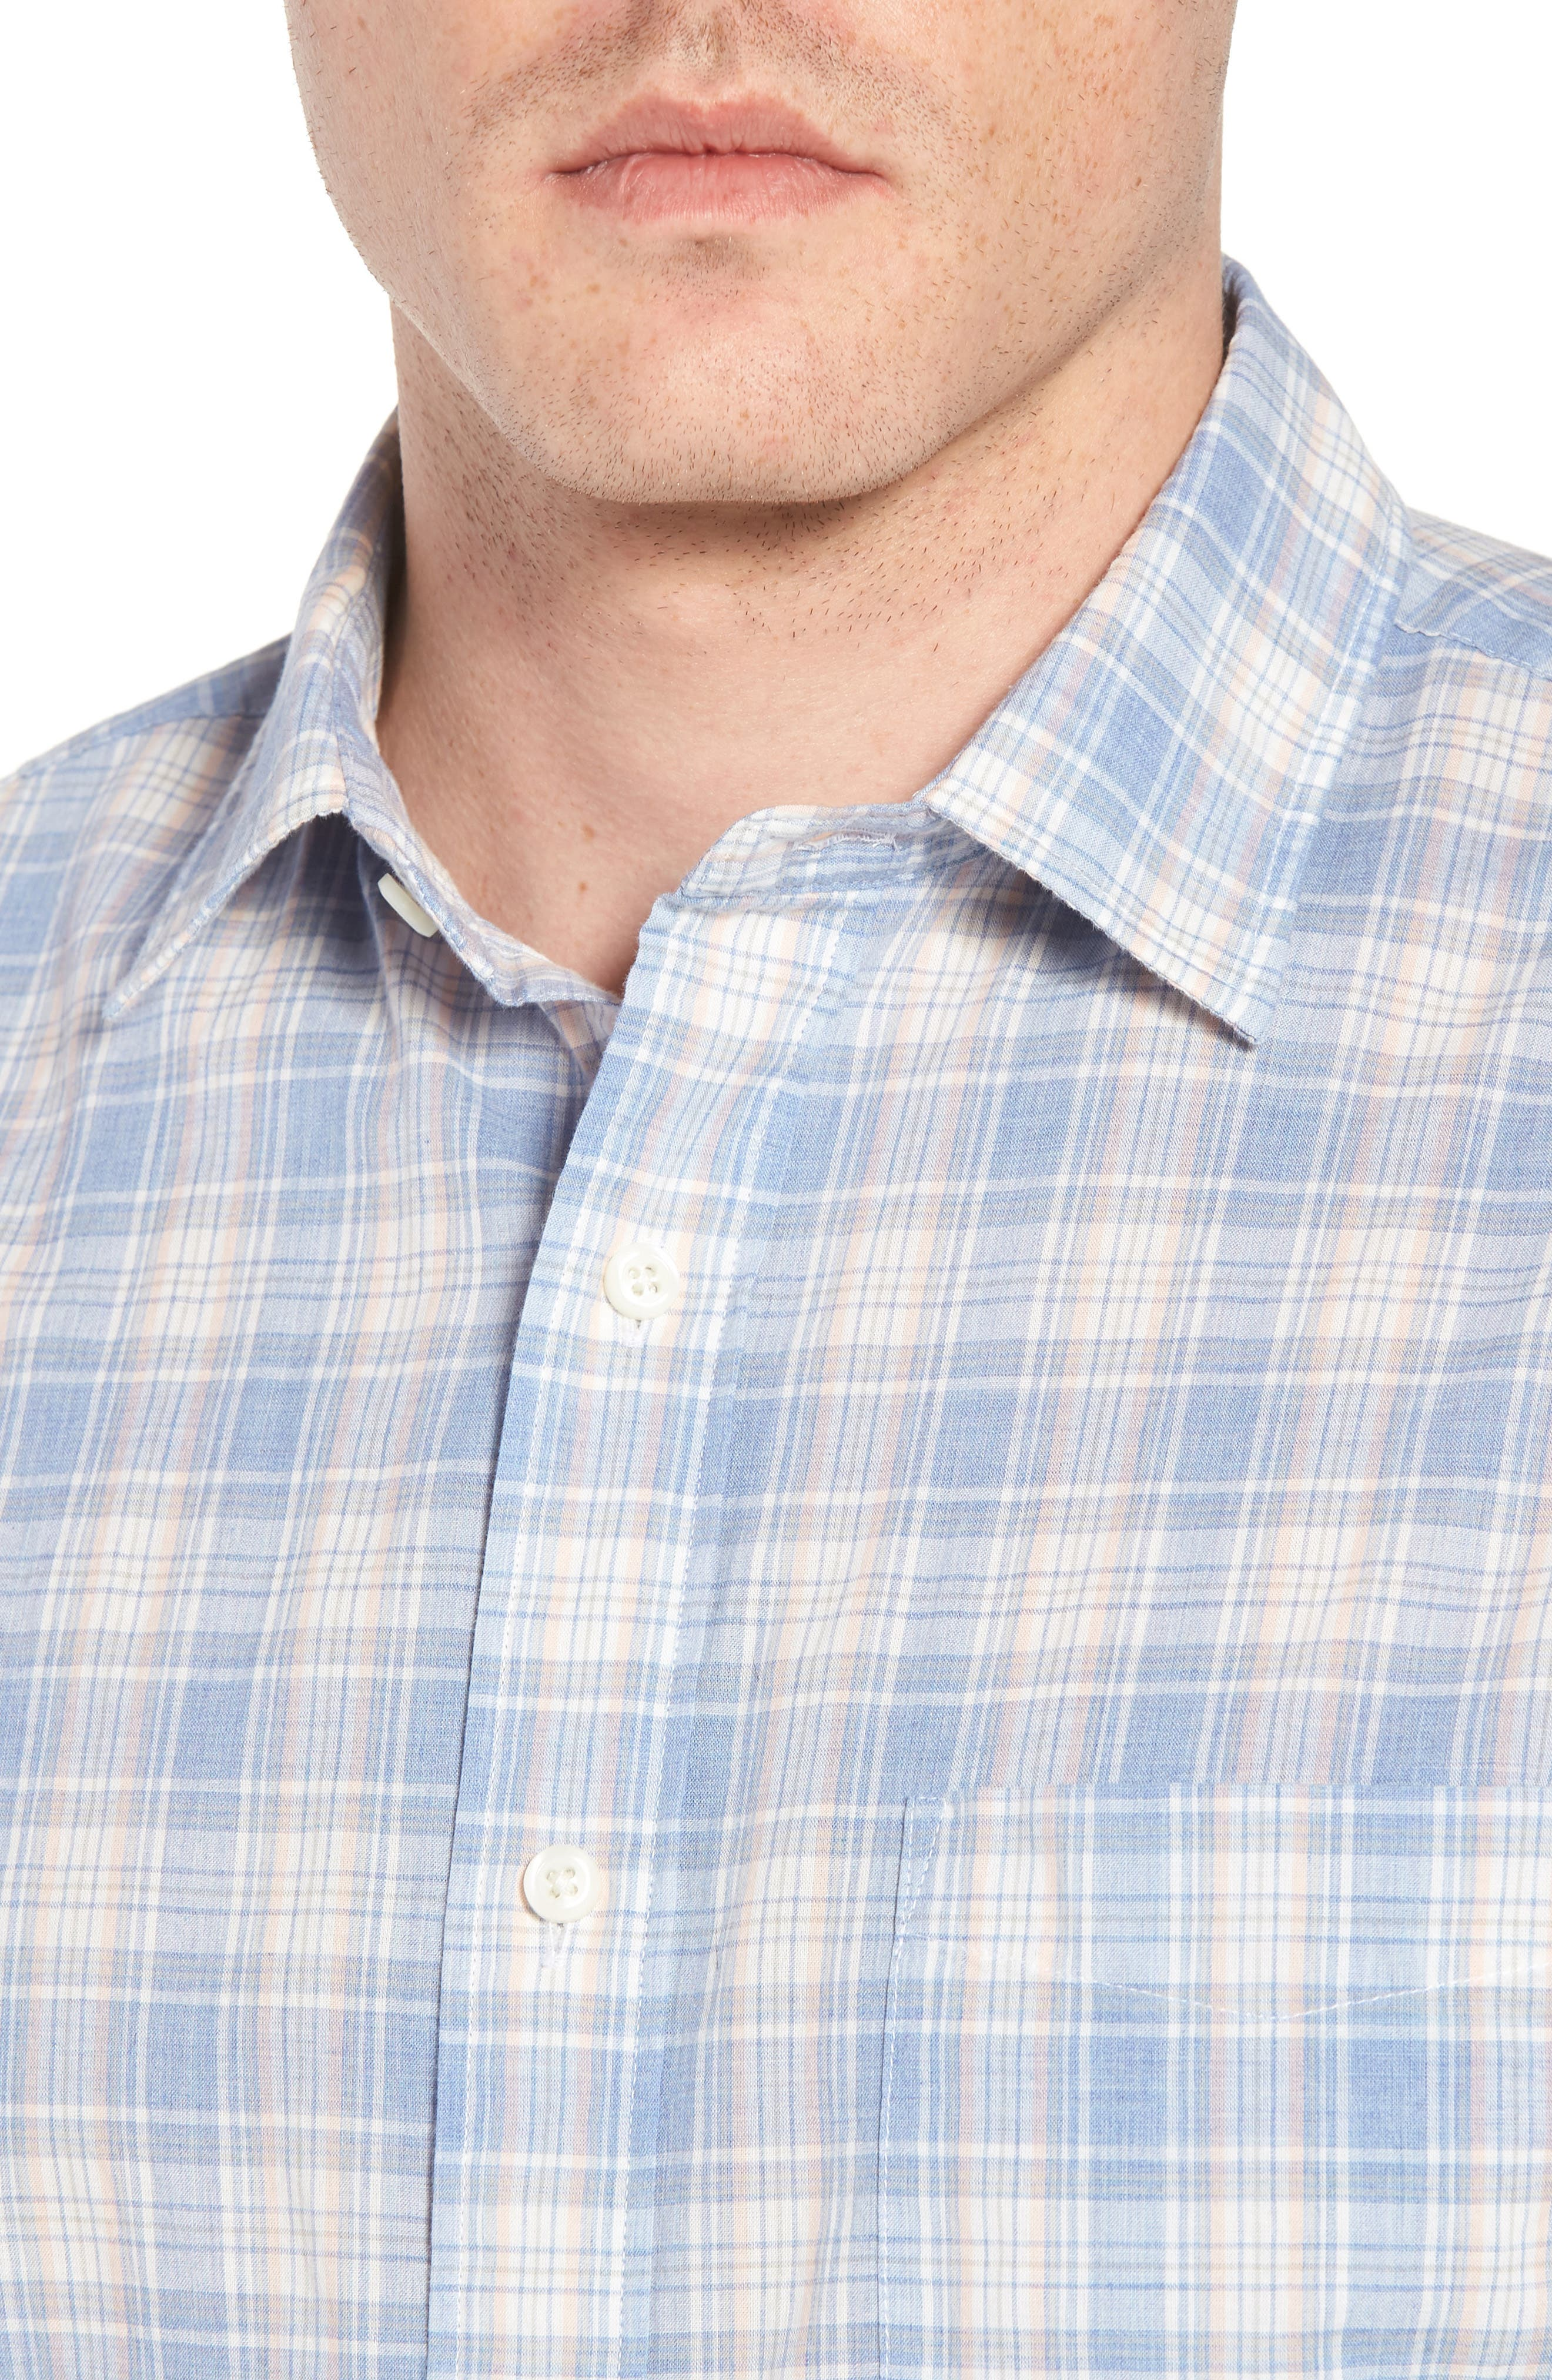 Ventura Plaid Sport Shirt,                             Alternate thumbnail 4, color,                             BLUE CORAL GREY